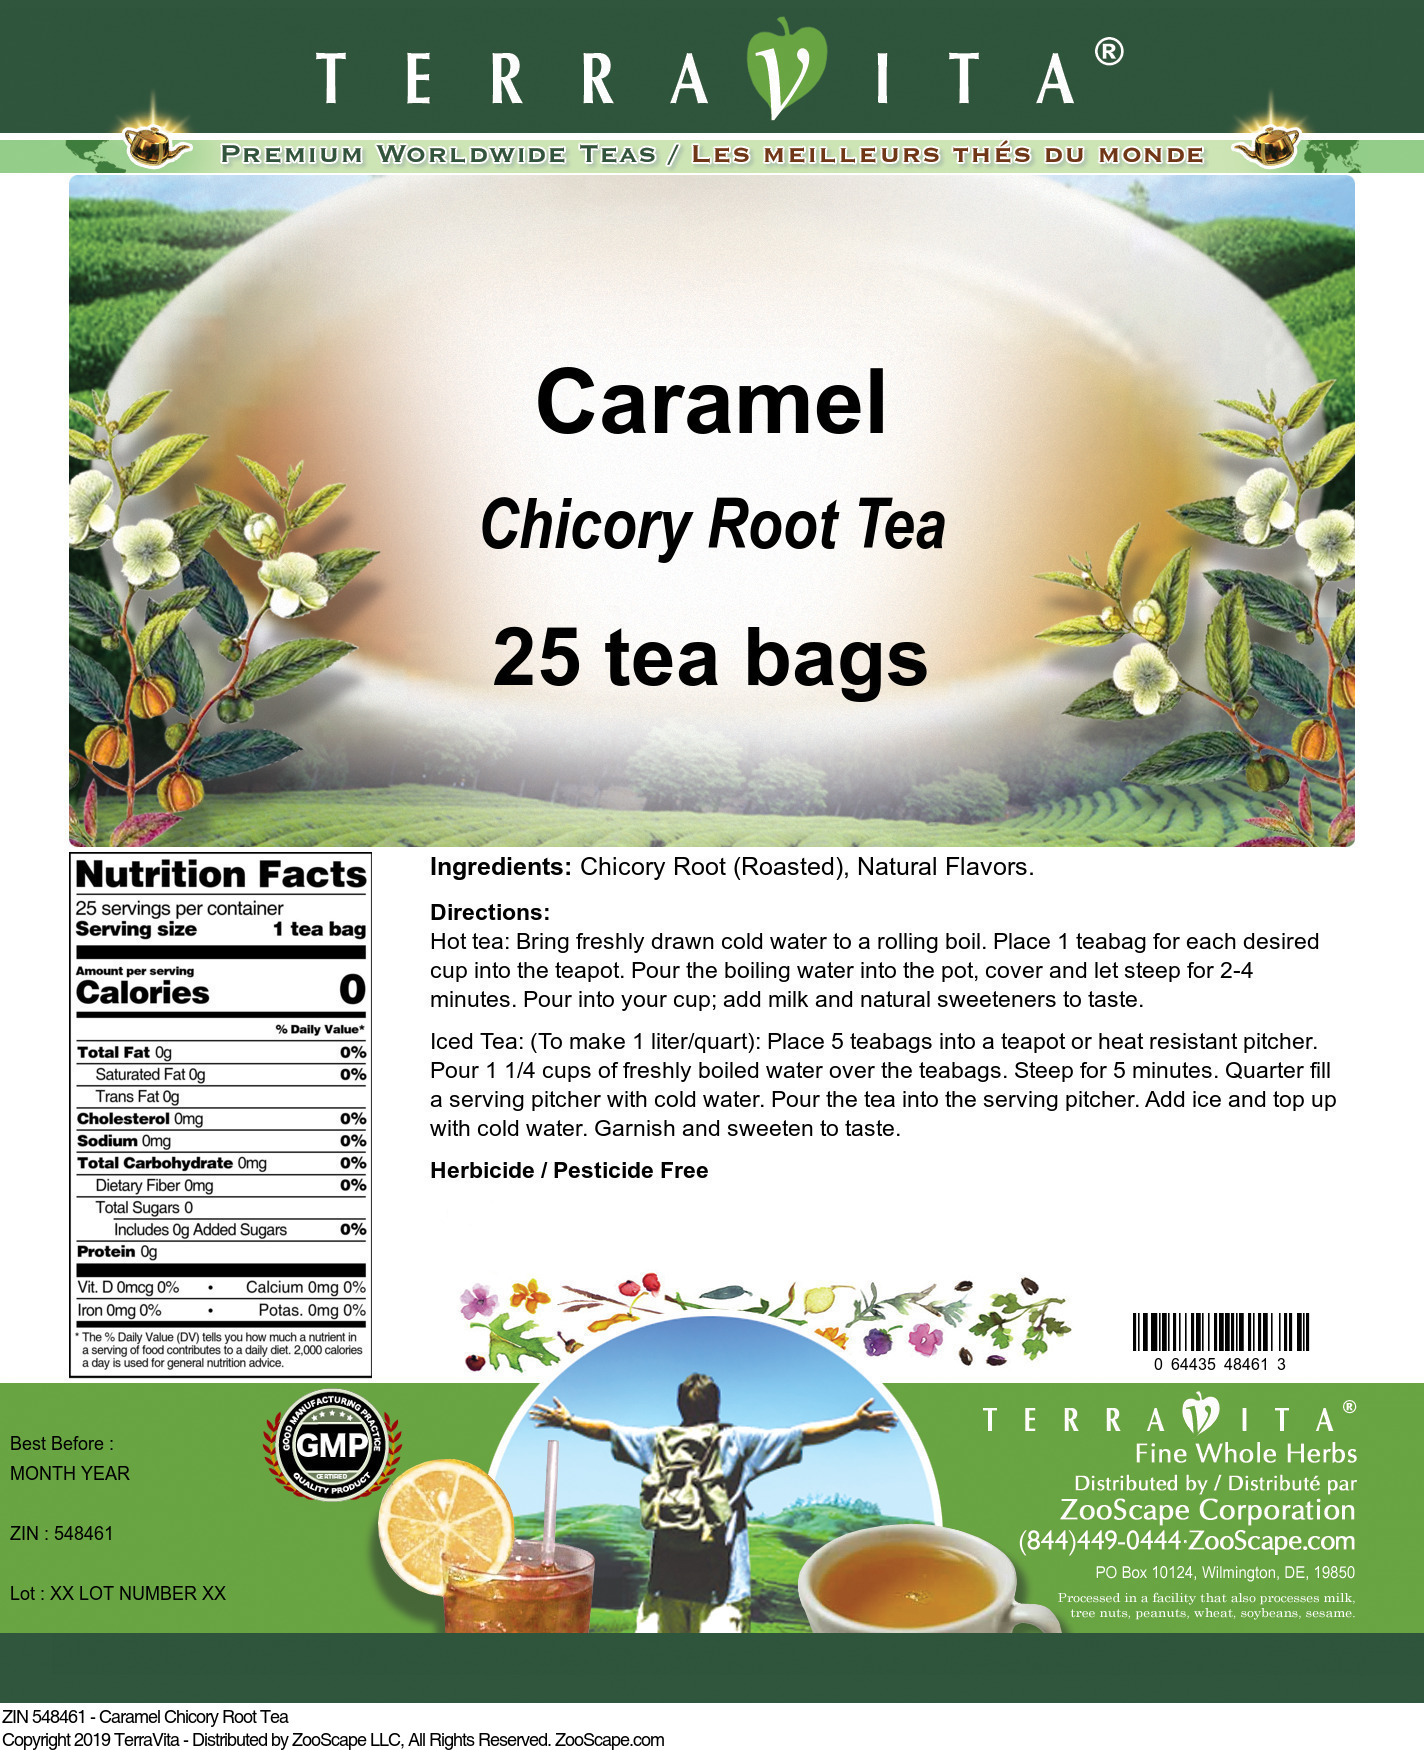 Caramel Chicory Root Tea